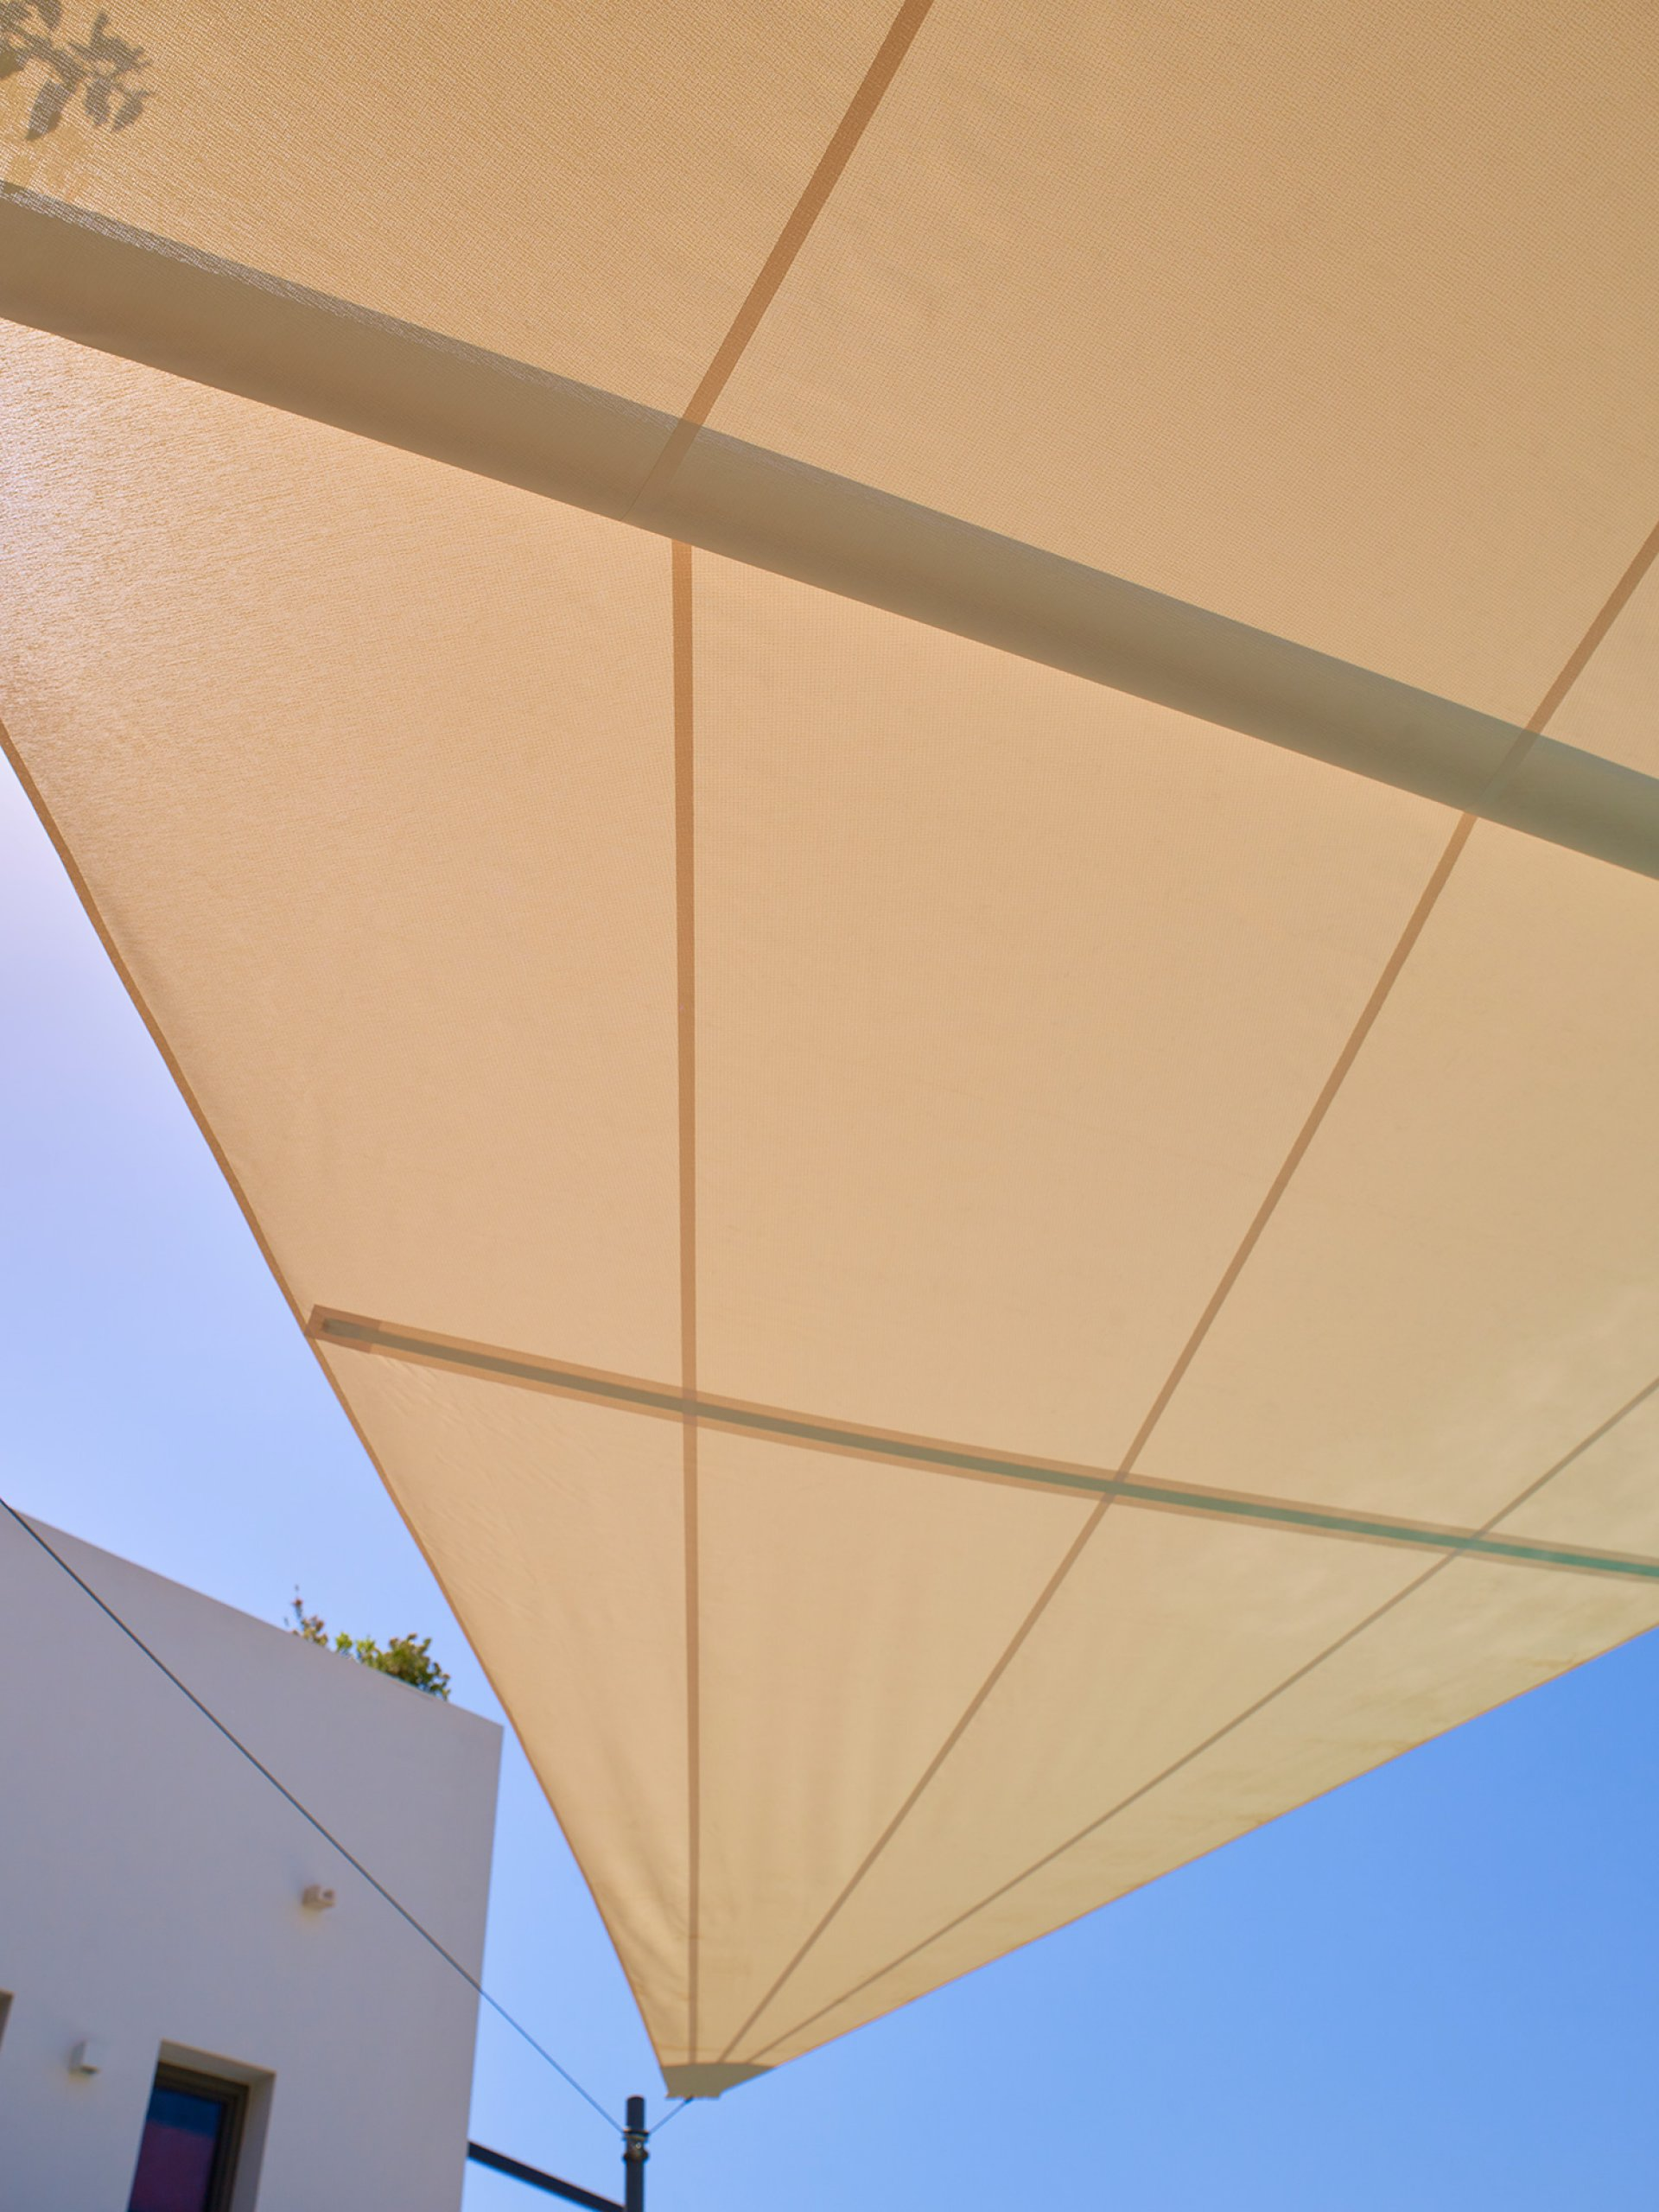 SunSquare Sonnensegel - das Original